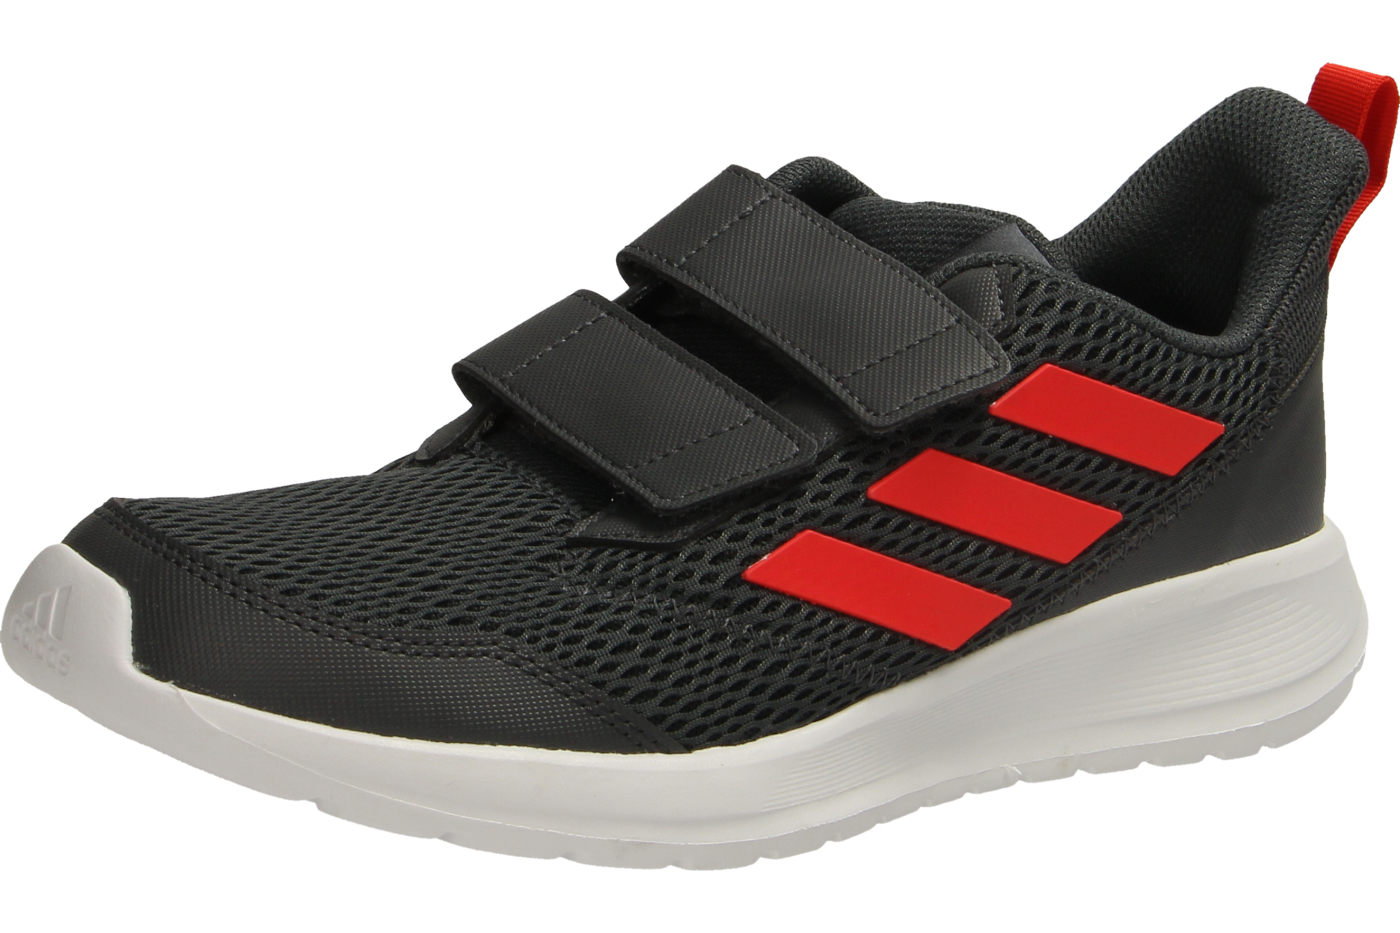 Adidas AltaRUN CF Laufschuh Laufschuh CG6896 30